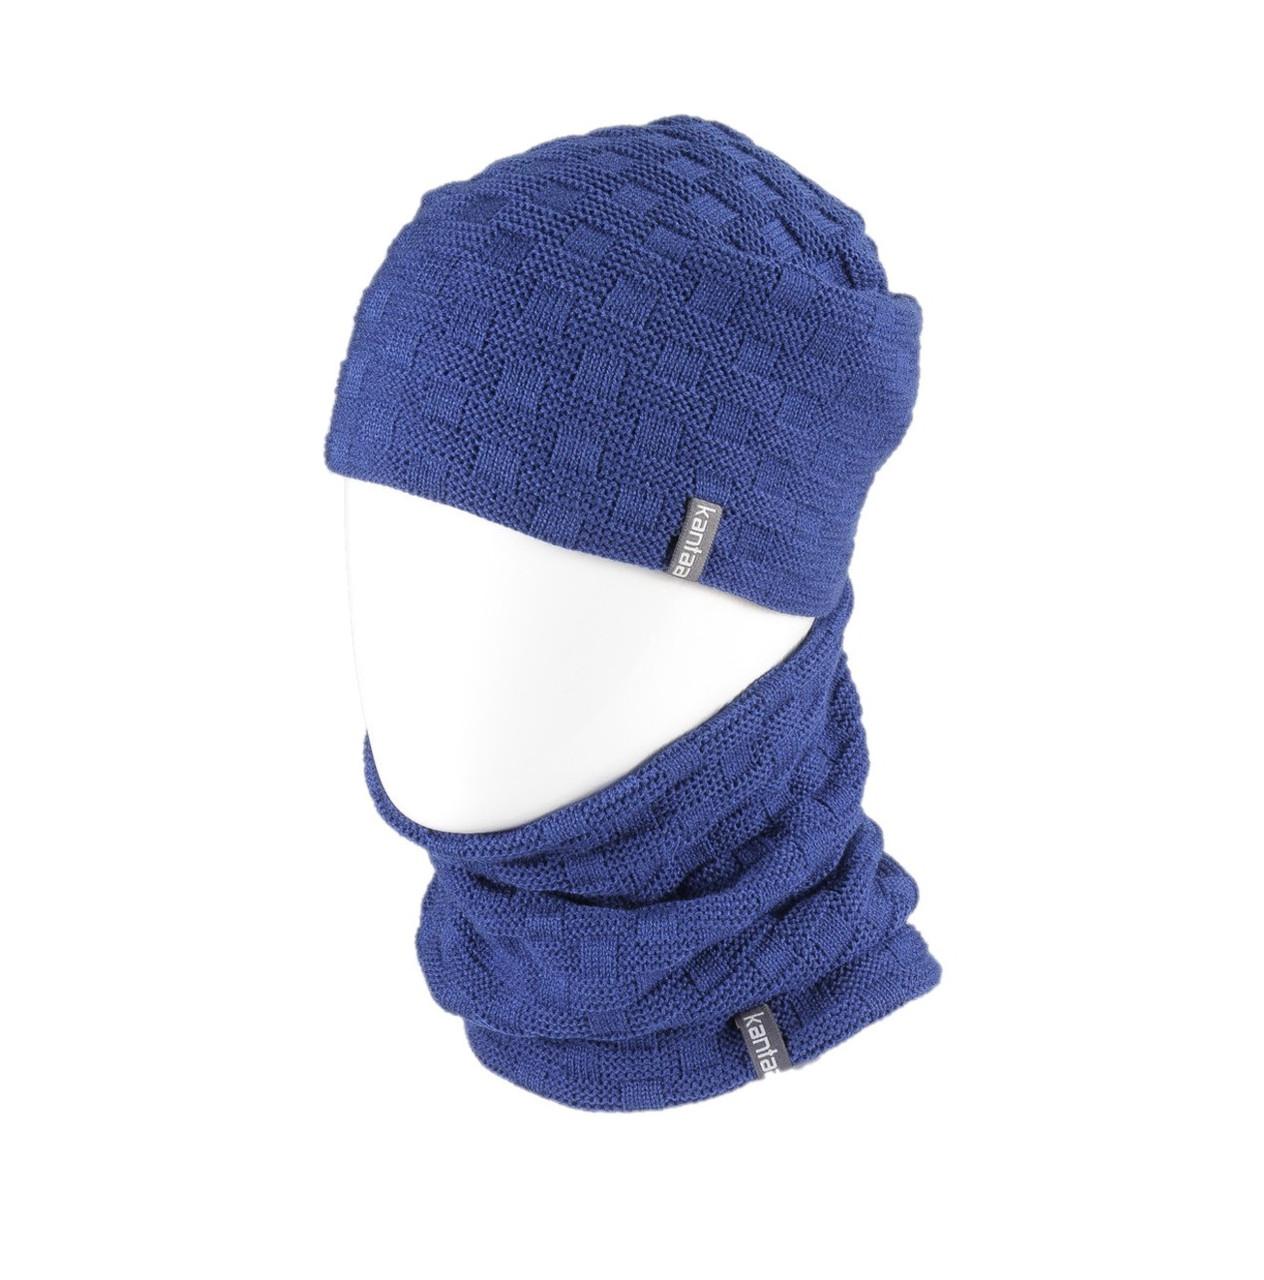 Вязаная шапка с Buff снуд КАНТА унисекс размер взрослый, синий (OC-078)